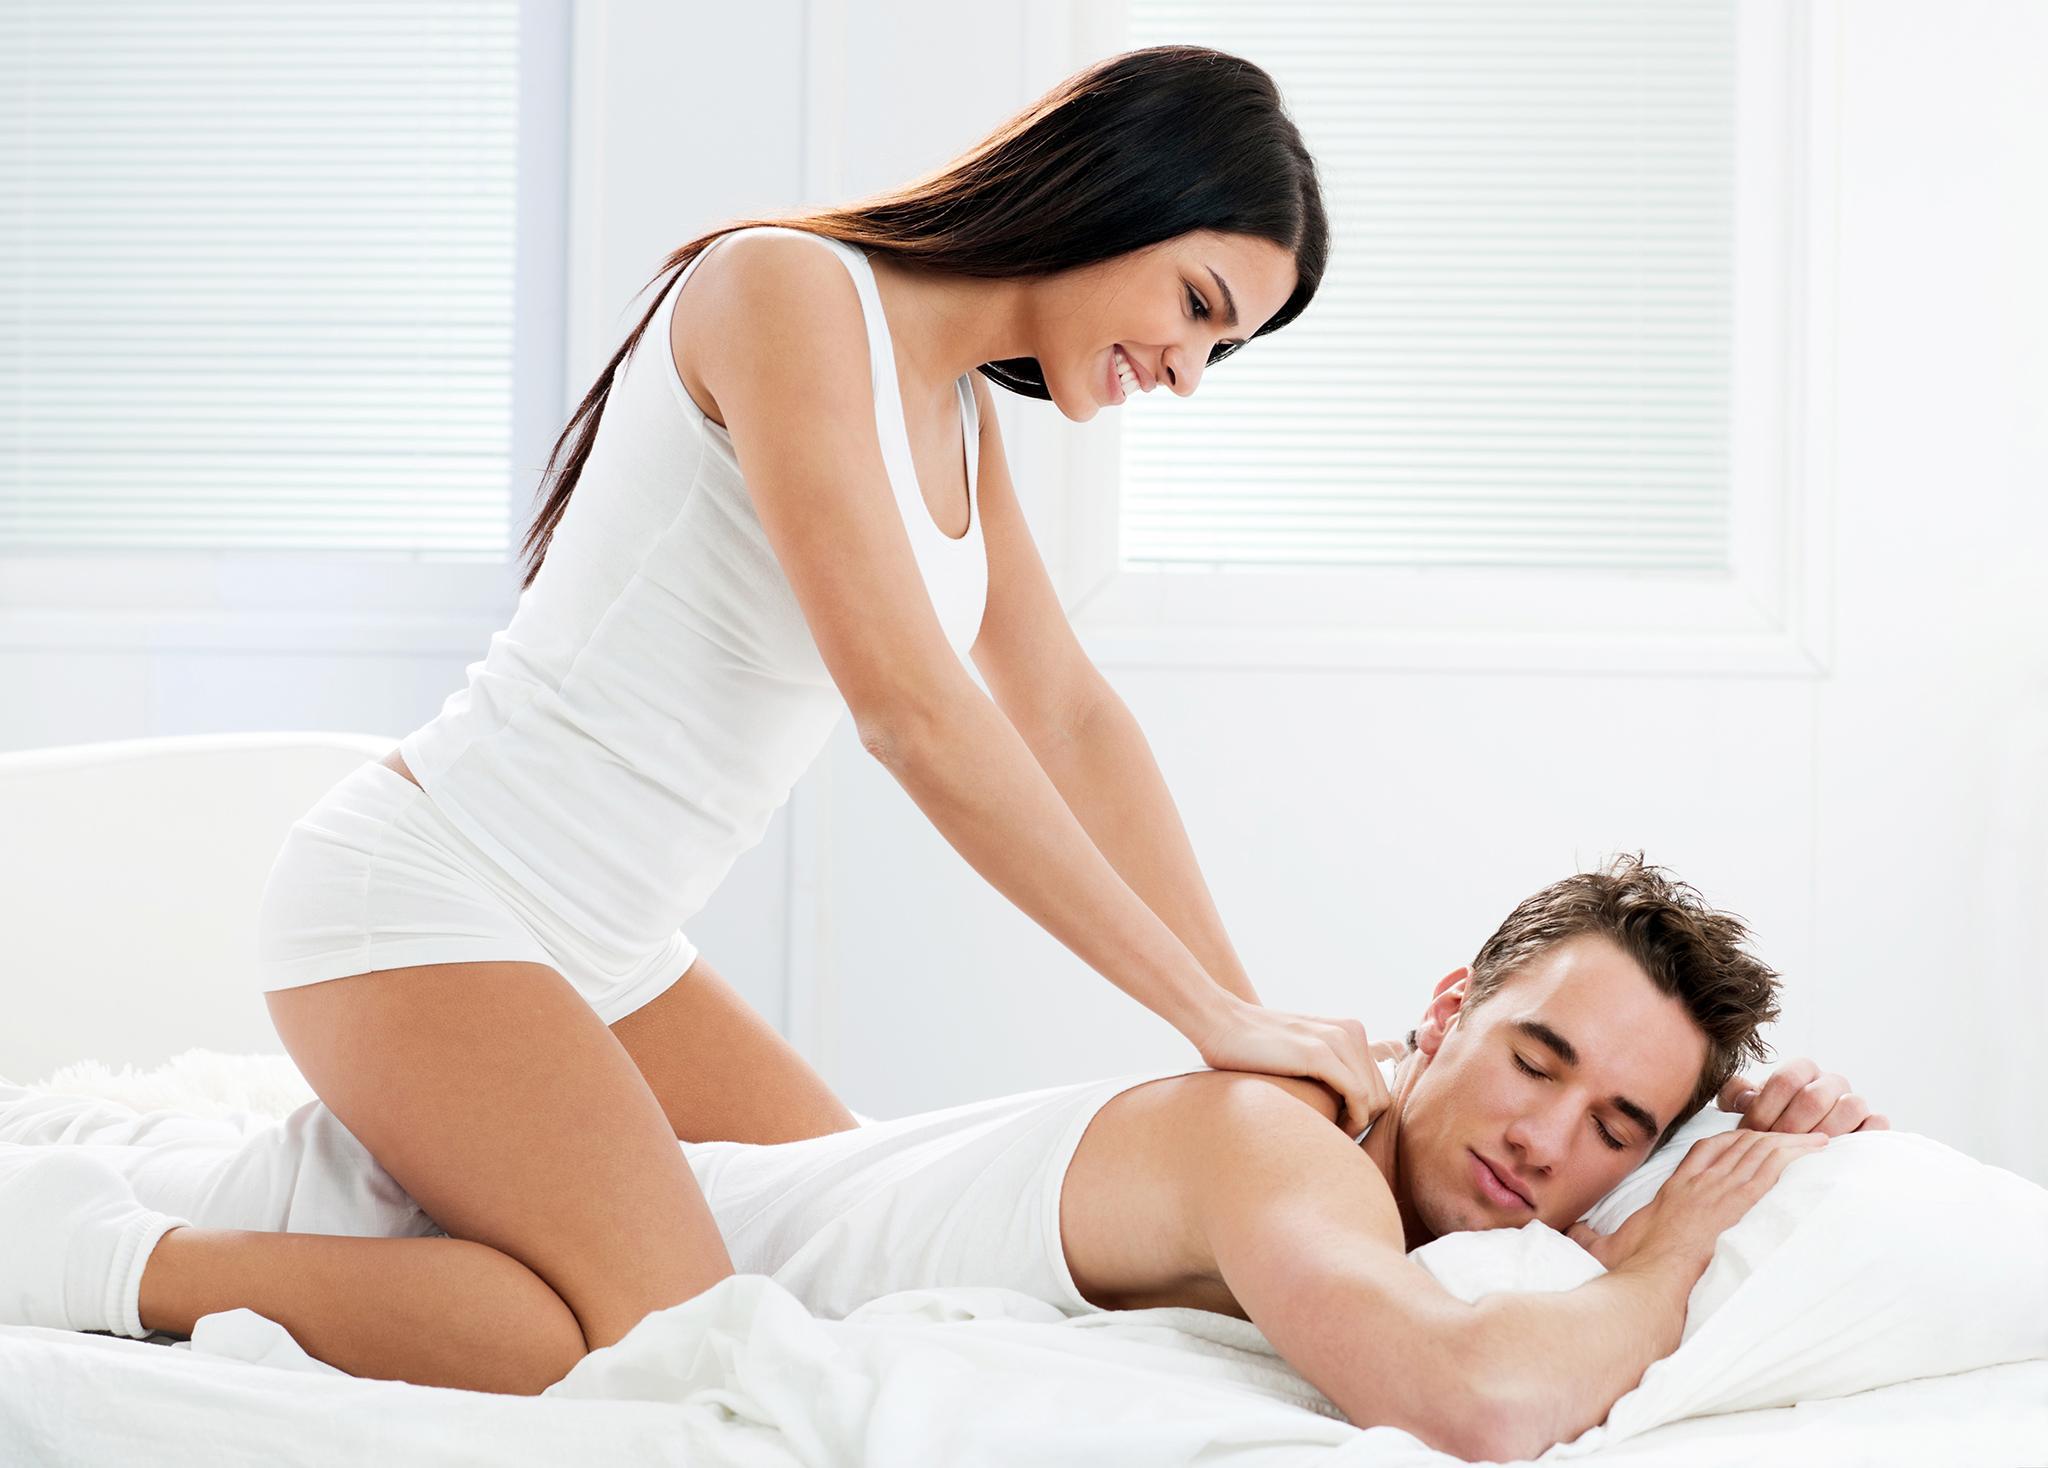 Лесбийский массаж клитора до оргазма смотреть порно смотреть порно такая